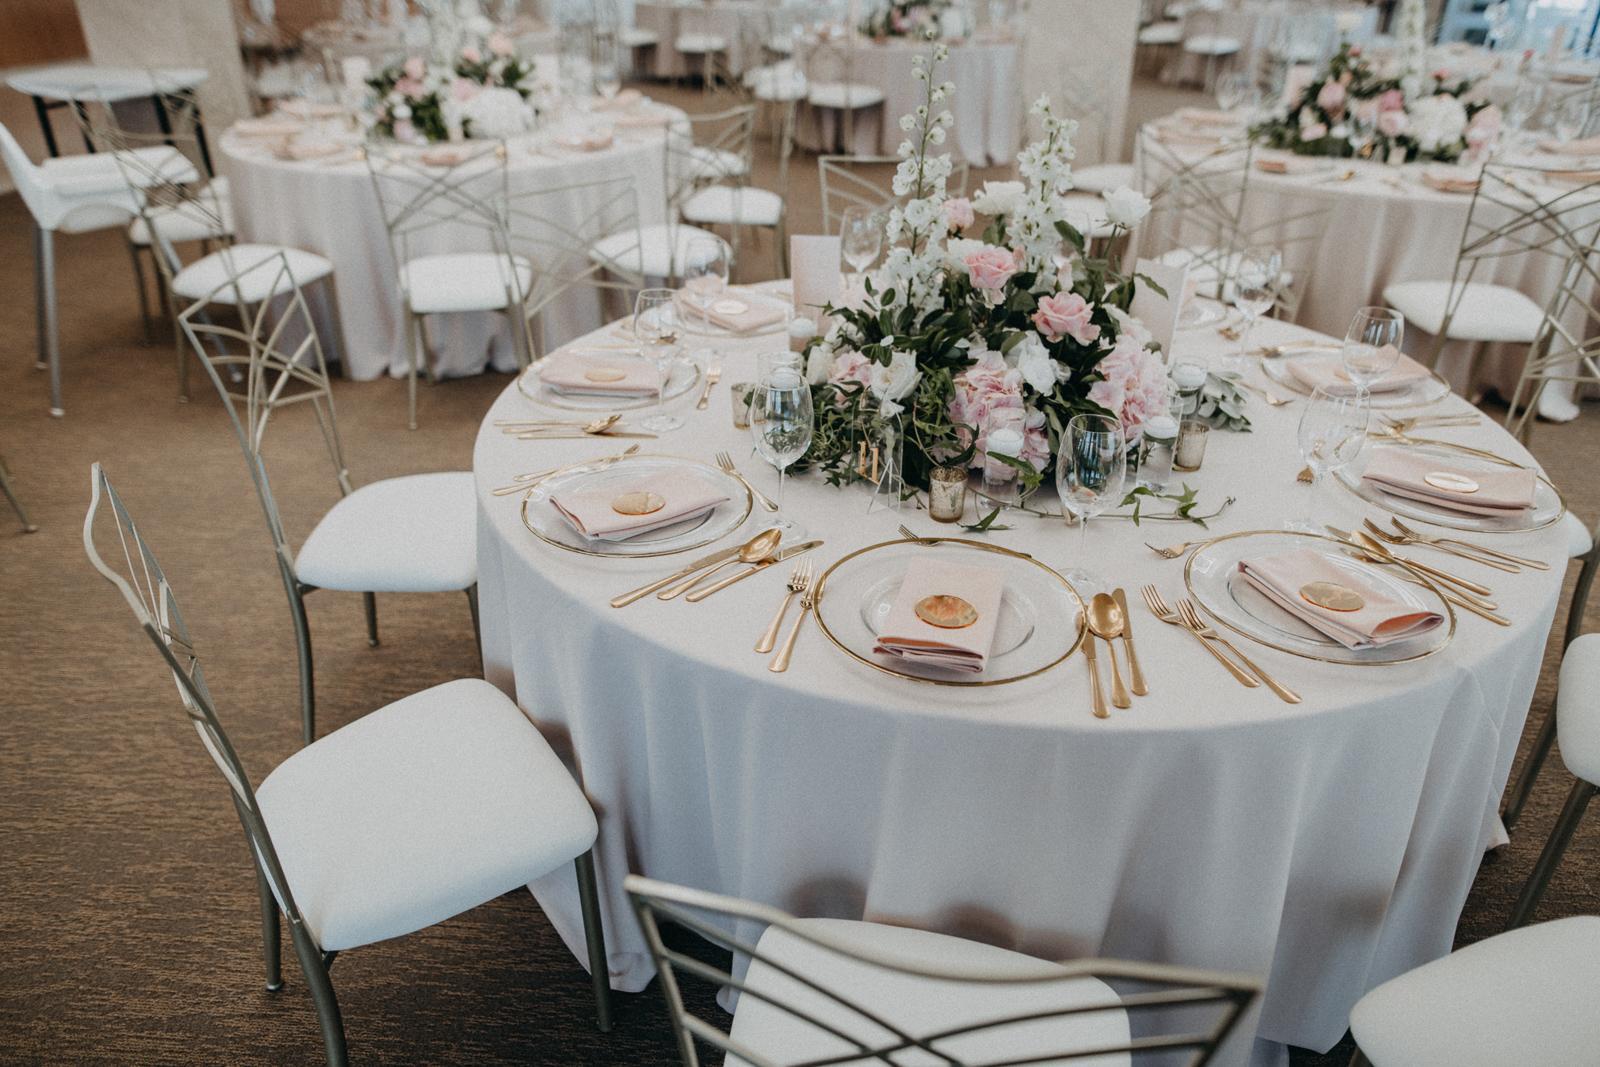 terezaklizanova_weddings - Obrázok č. 2